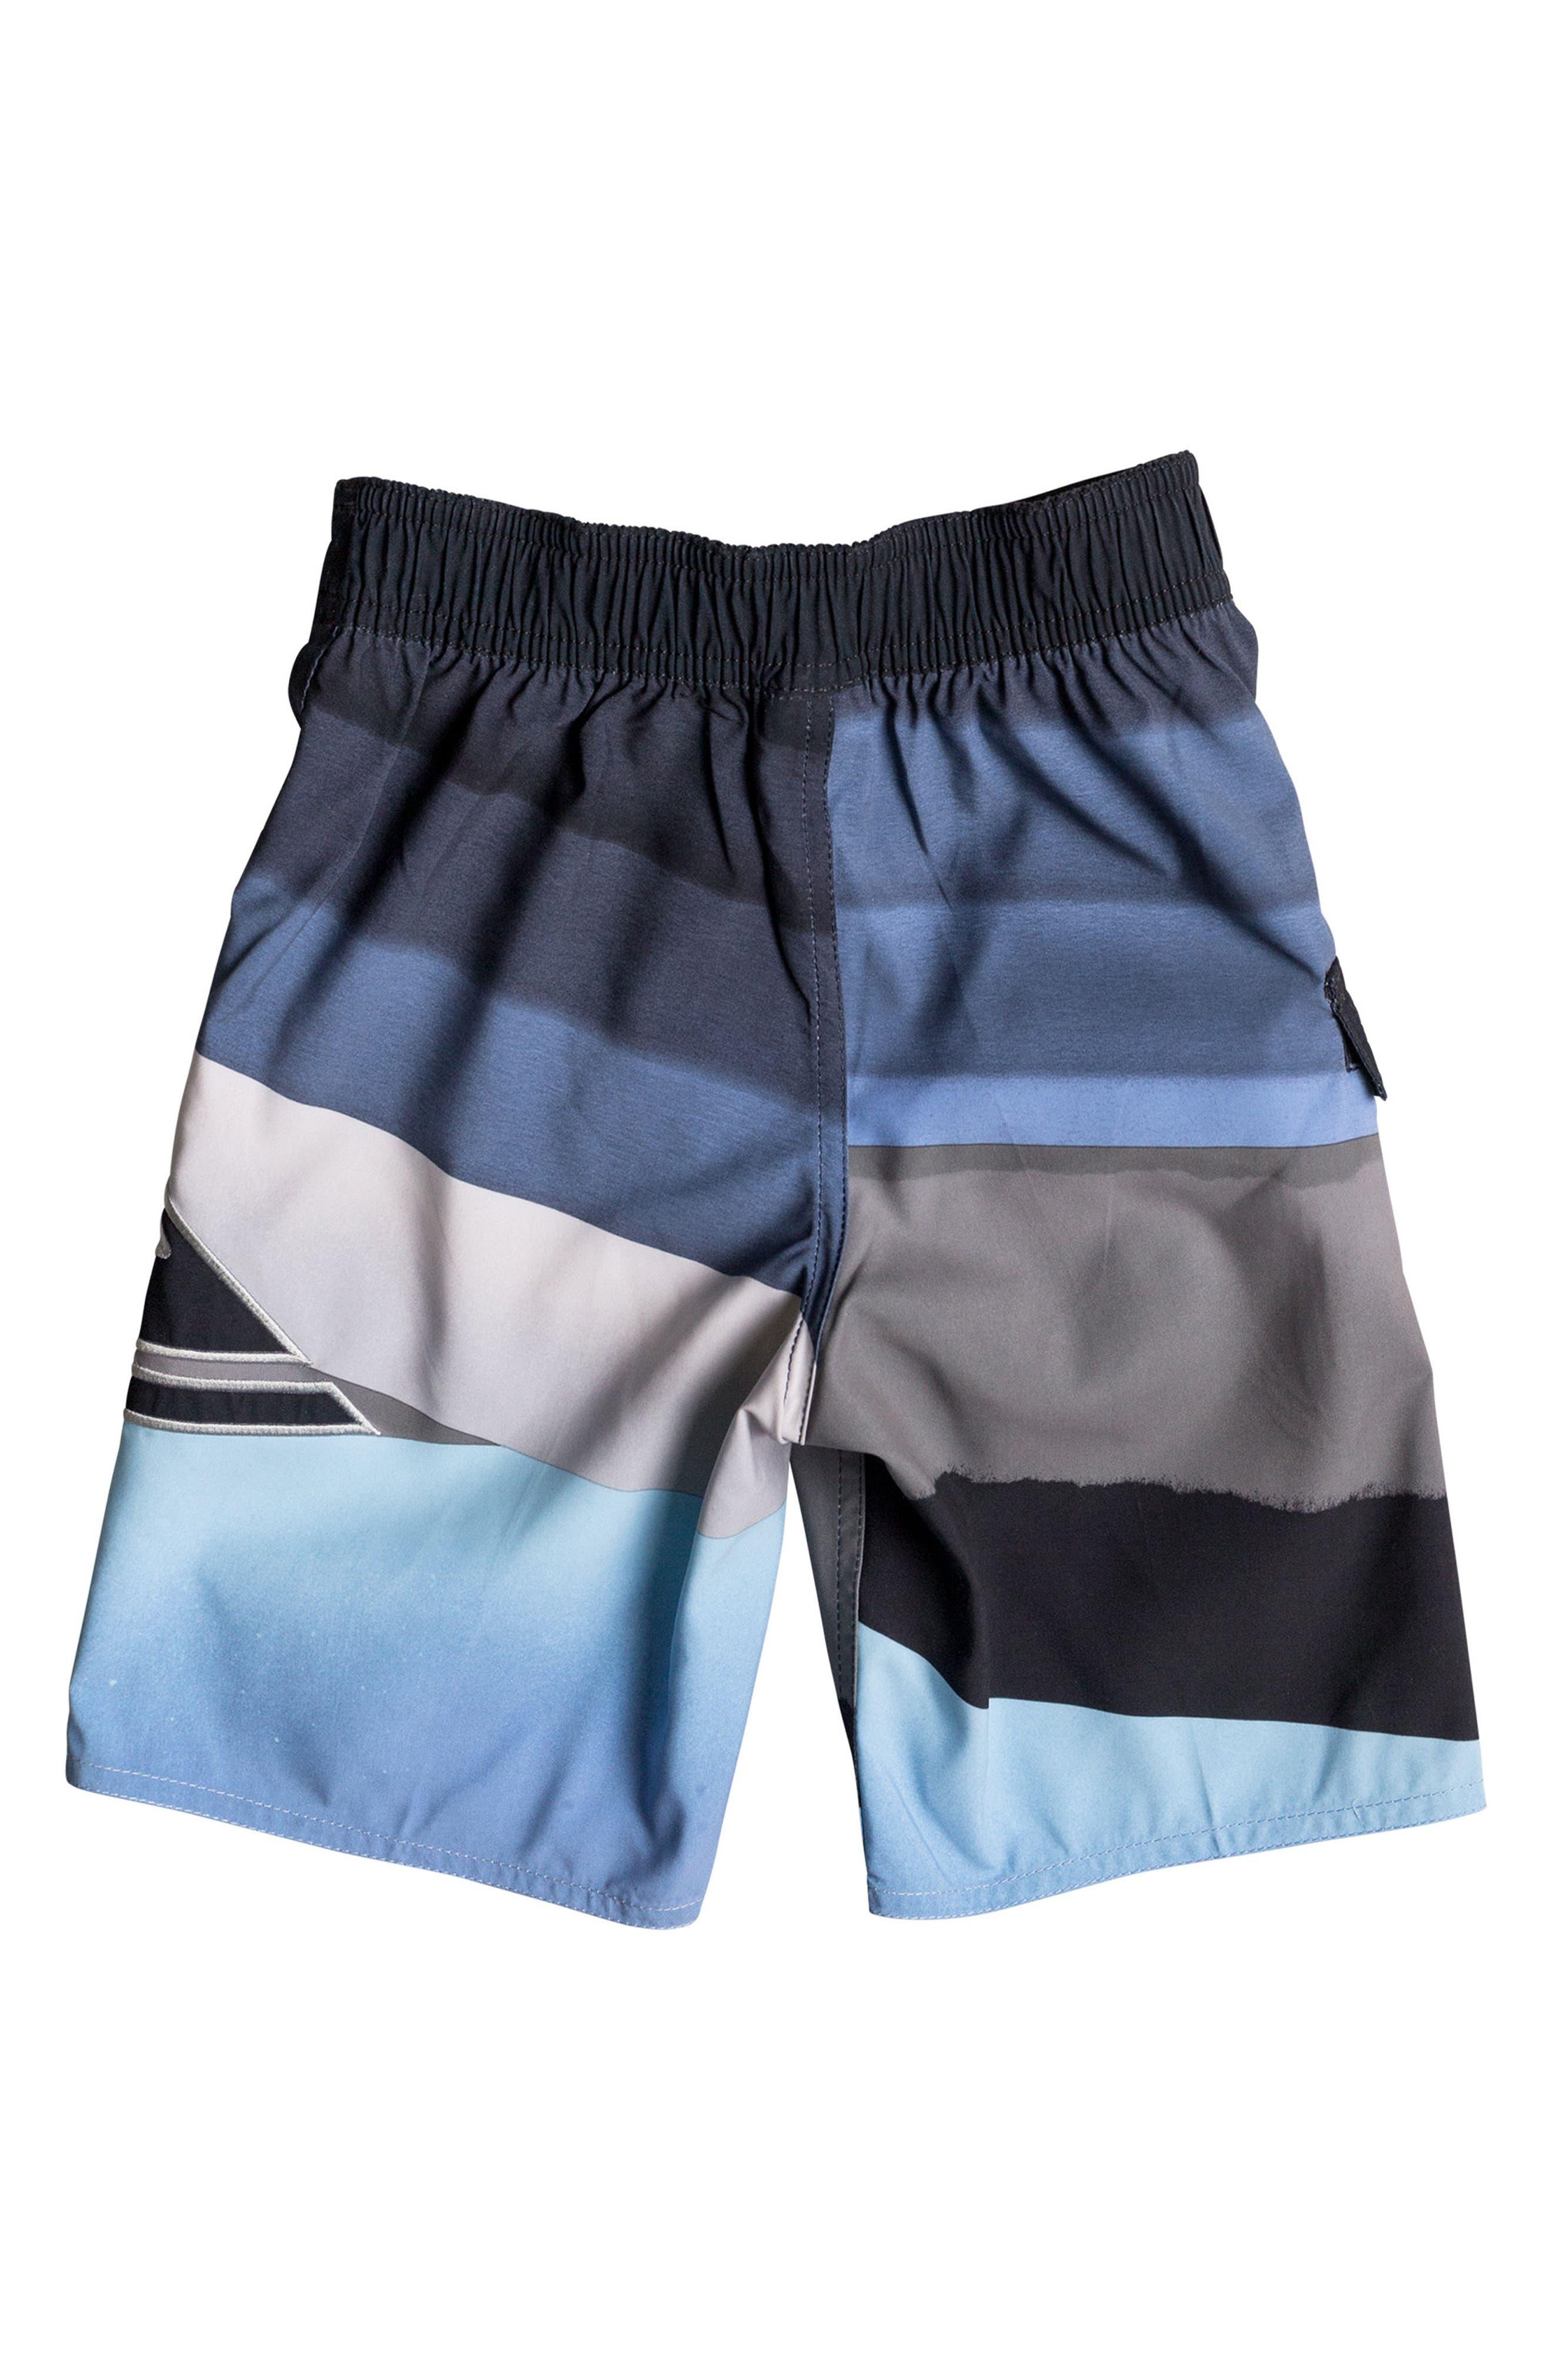 Slash Board Shorts,                             Alternate thumbnail 2, color,                             440